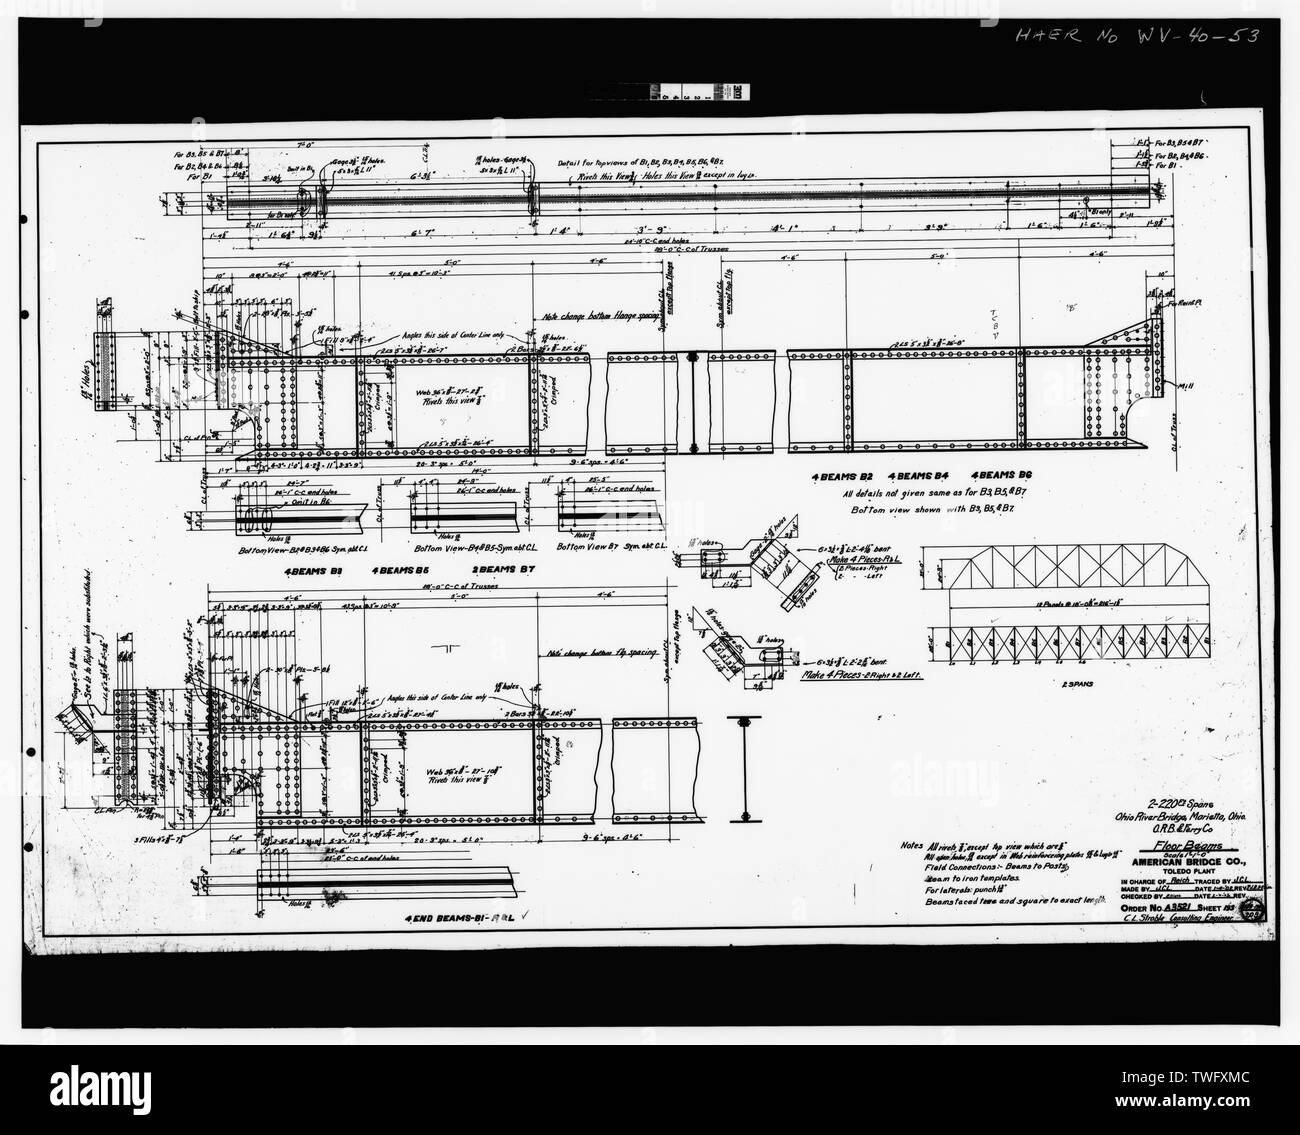 Plan Sheet -193 - Williamstown-Marietta Bridge, Spanning Ohio River between Williamstown and Marietta, Williamstown, Wood County, WV; American Bridge Company; Strobel, Charles L; Ripley, T M - Stock Image